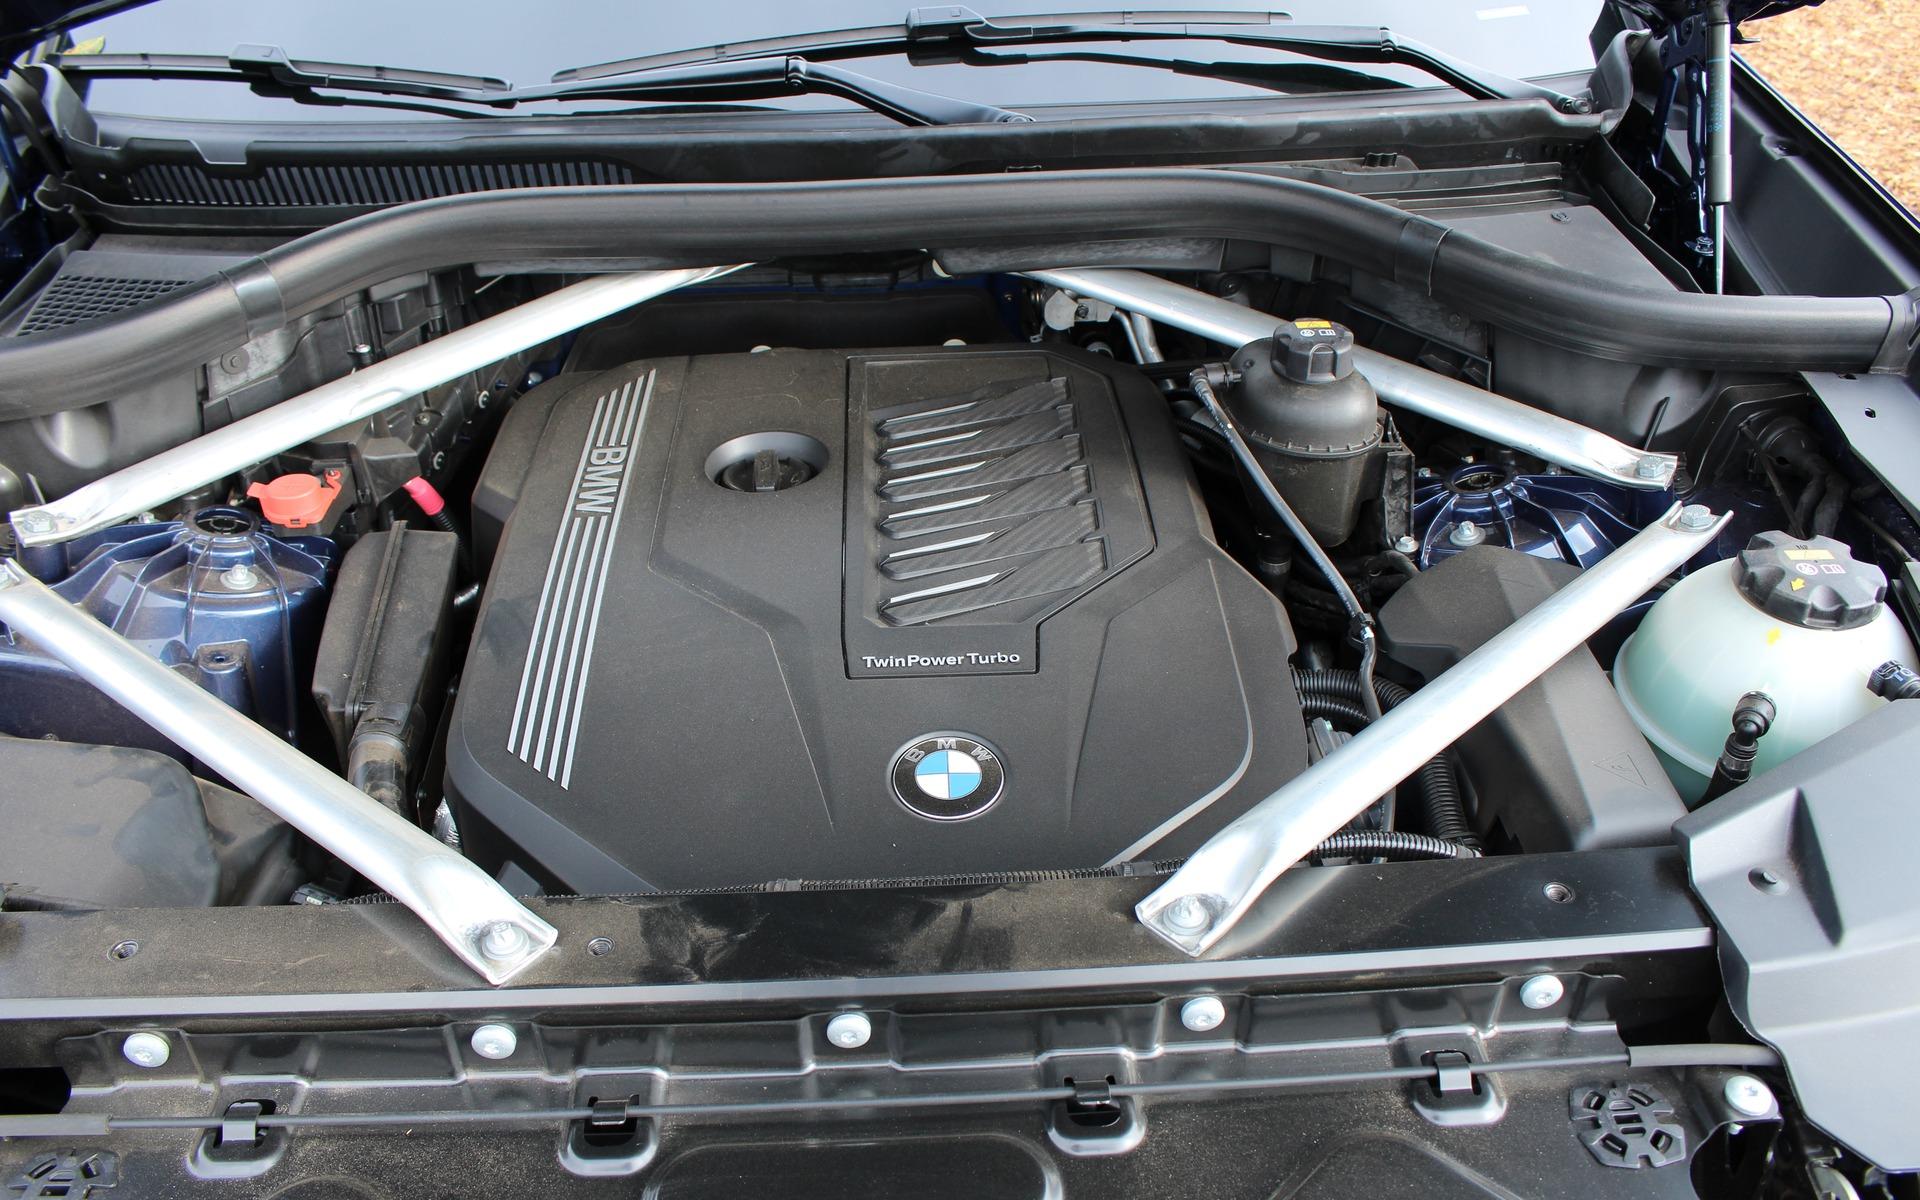 BMW X5 2019 : évolution technologique 349912_2019_BMW_X5